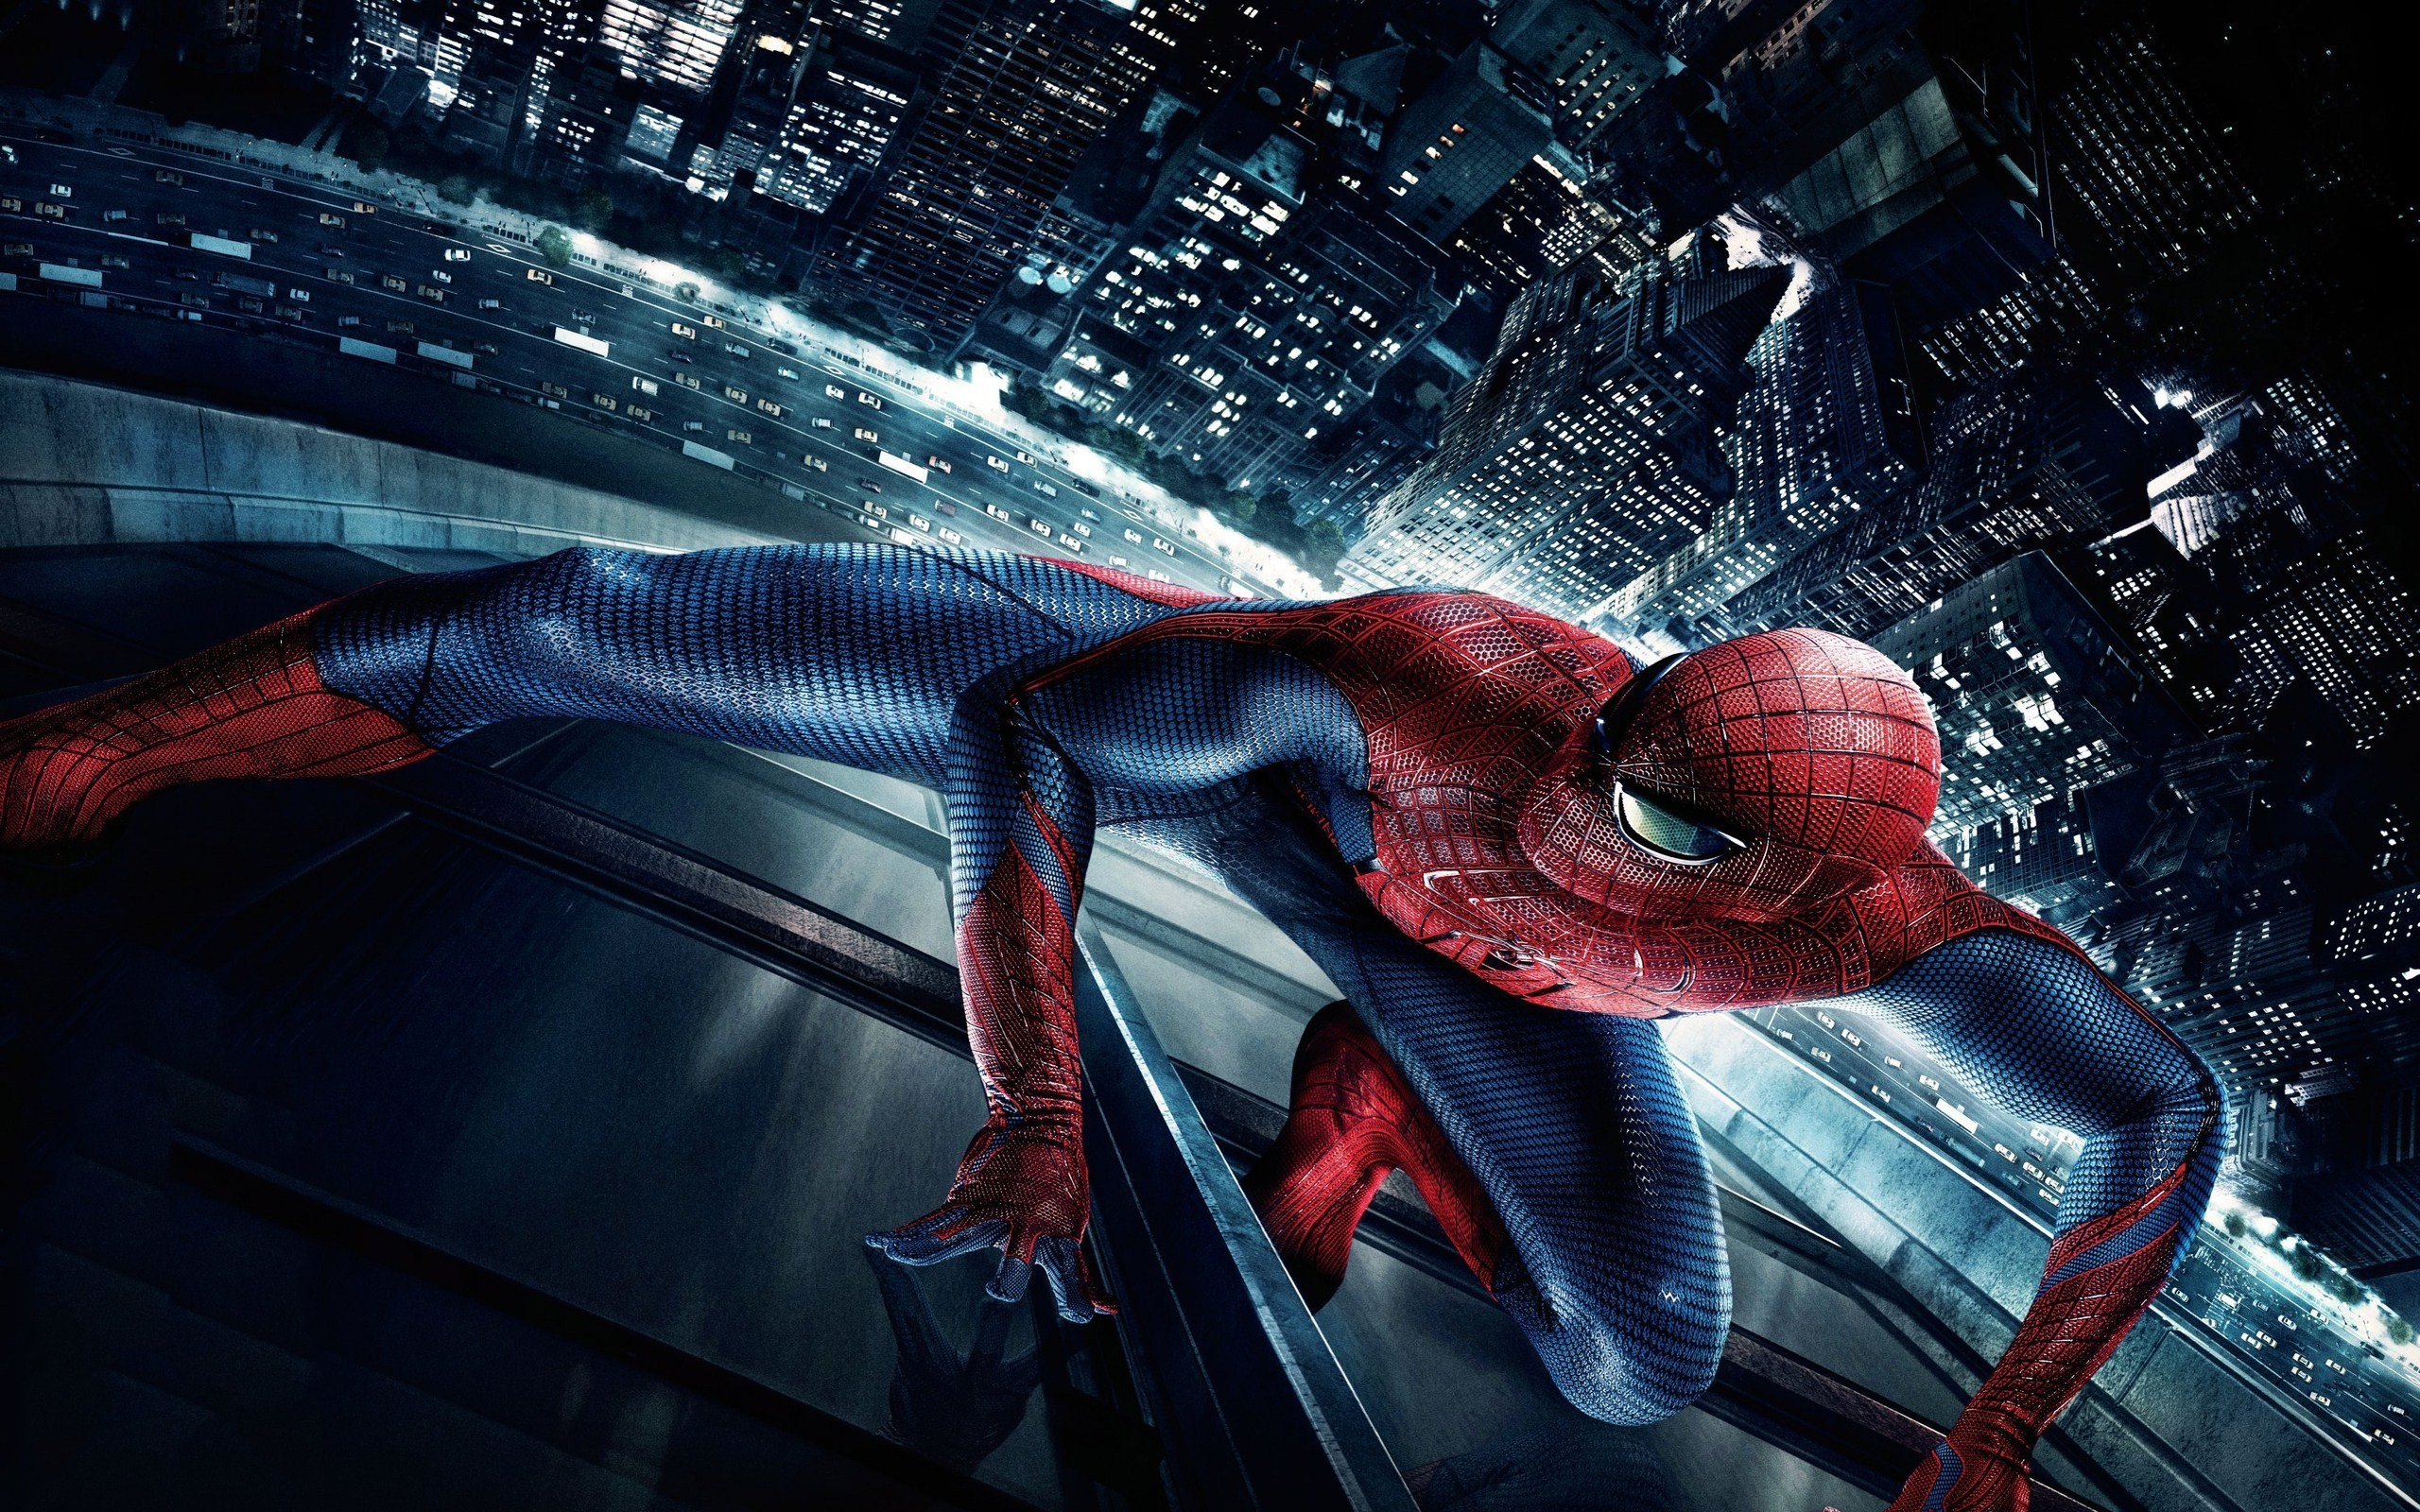 Spiderman 4 3d Wallpaper Photo – Ndemok.com